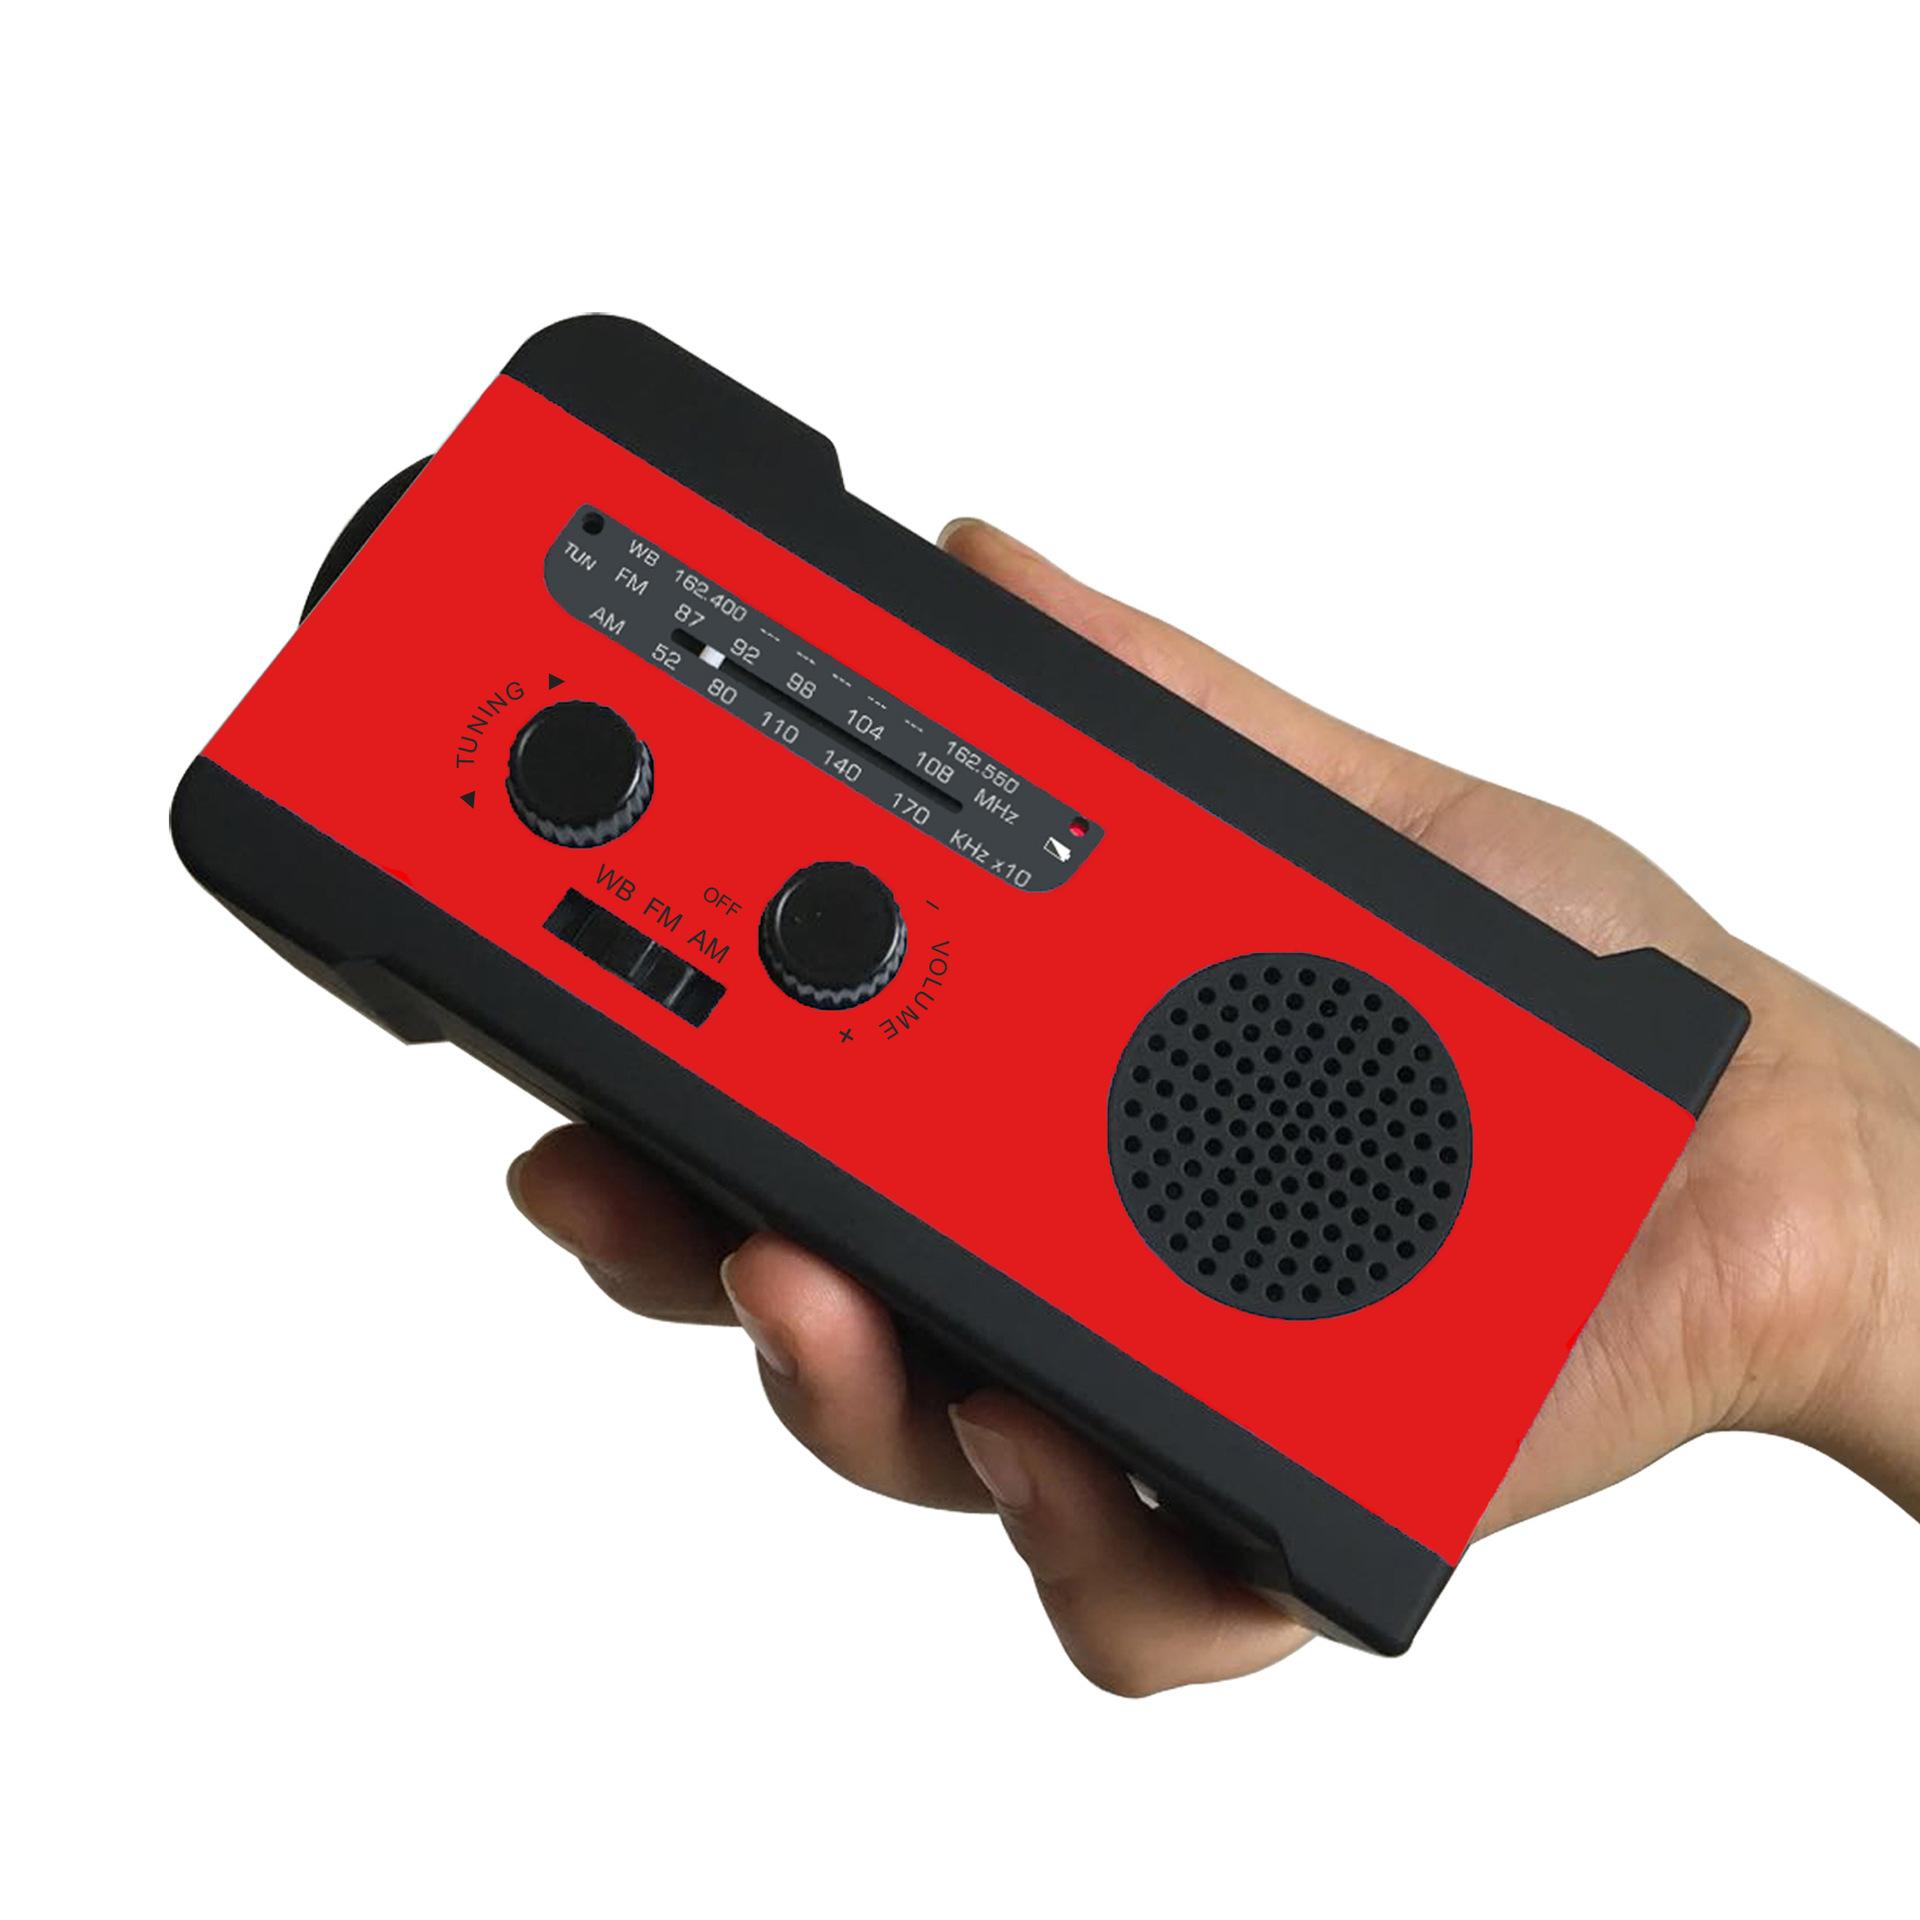 WAYHOOM Solar radio Hand crank SOS radio 2000mAh mobile phone emergency charging